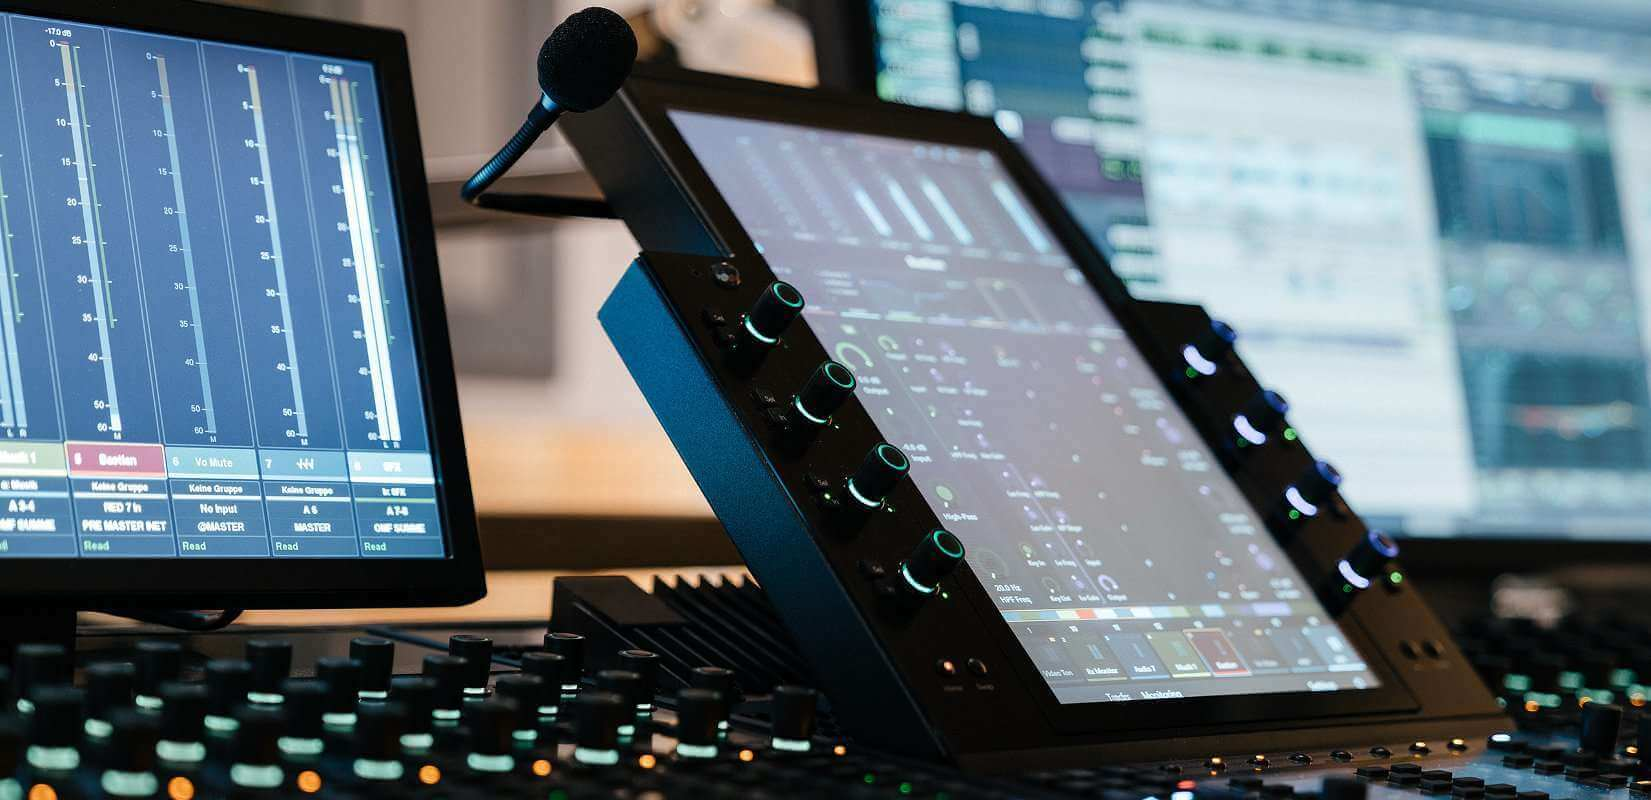 S6 Konsole Closeup seitlich mit Tonstudio Monitor